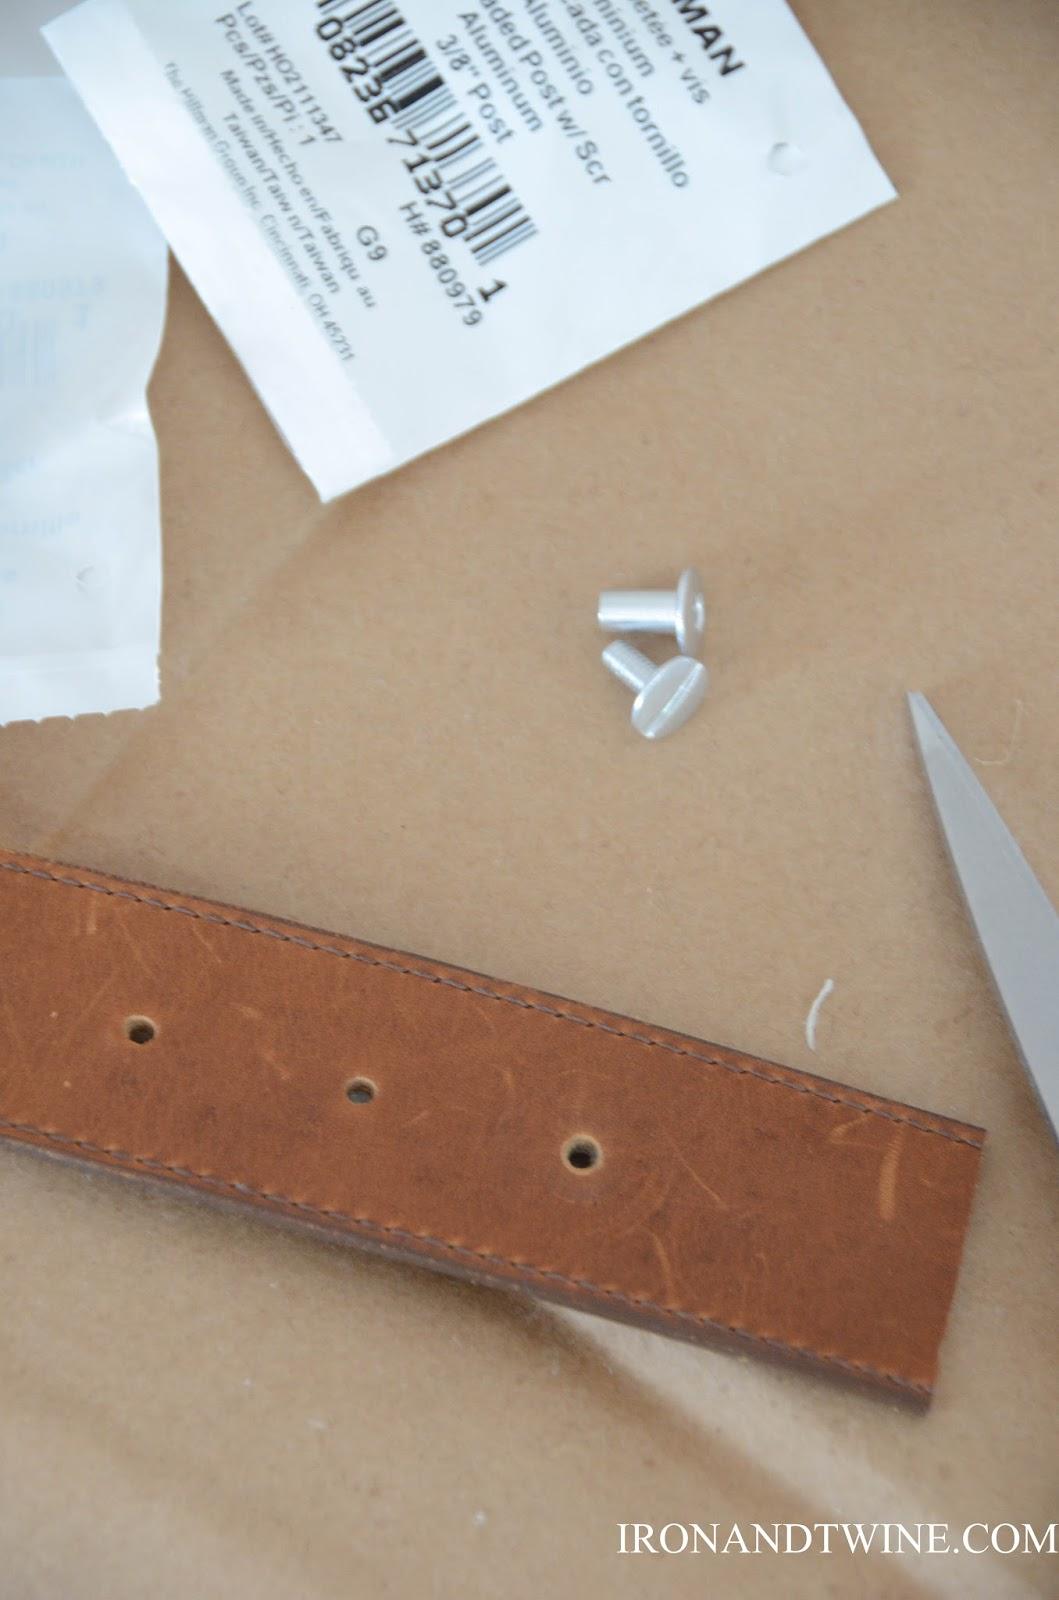 DIY+Belt+Handled+Box,+DIY+fabric+covered+box,+Iron+and+Twine+(34).jpg